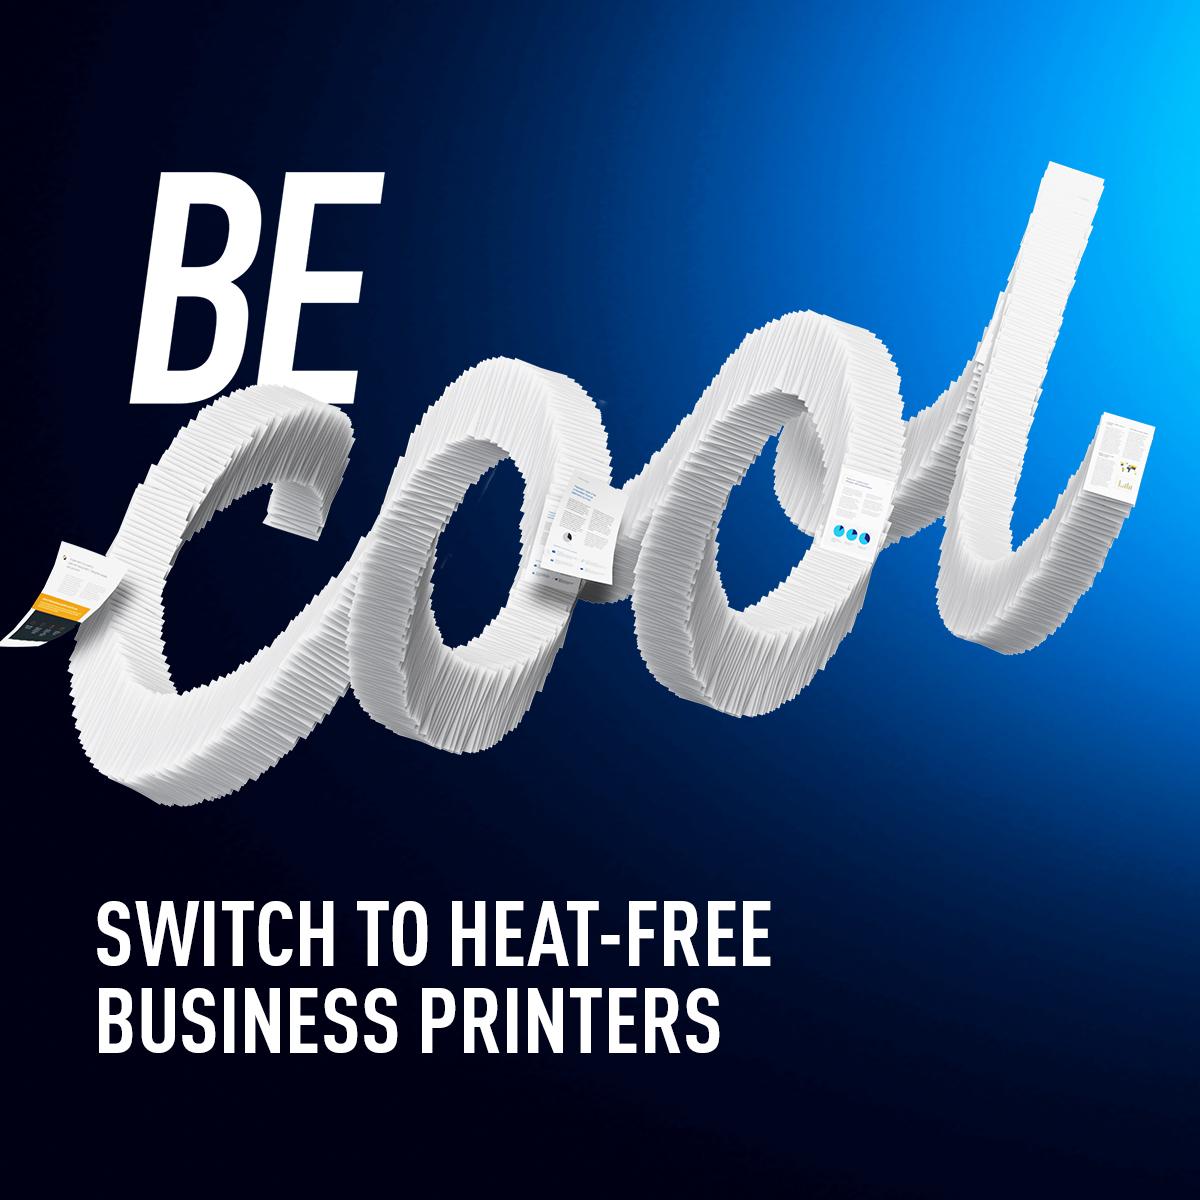 Demi masa depan Bumi yang lebih baik, saatnya beralih ke teknologi Bebas-Panas #HeatFree.   https://t.co/TFLmvbF9y7  #BebasPanas #HeatFreeTech #EpsonHeatFree #SavePower  #sustainableprinting https://t.co/DruFHrDvLv